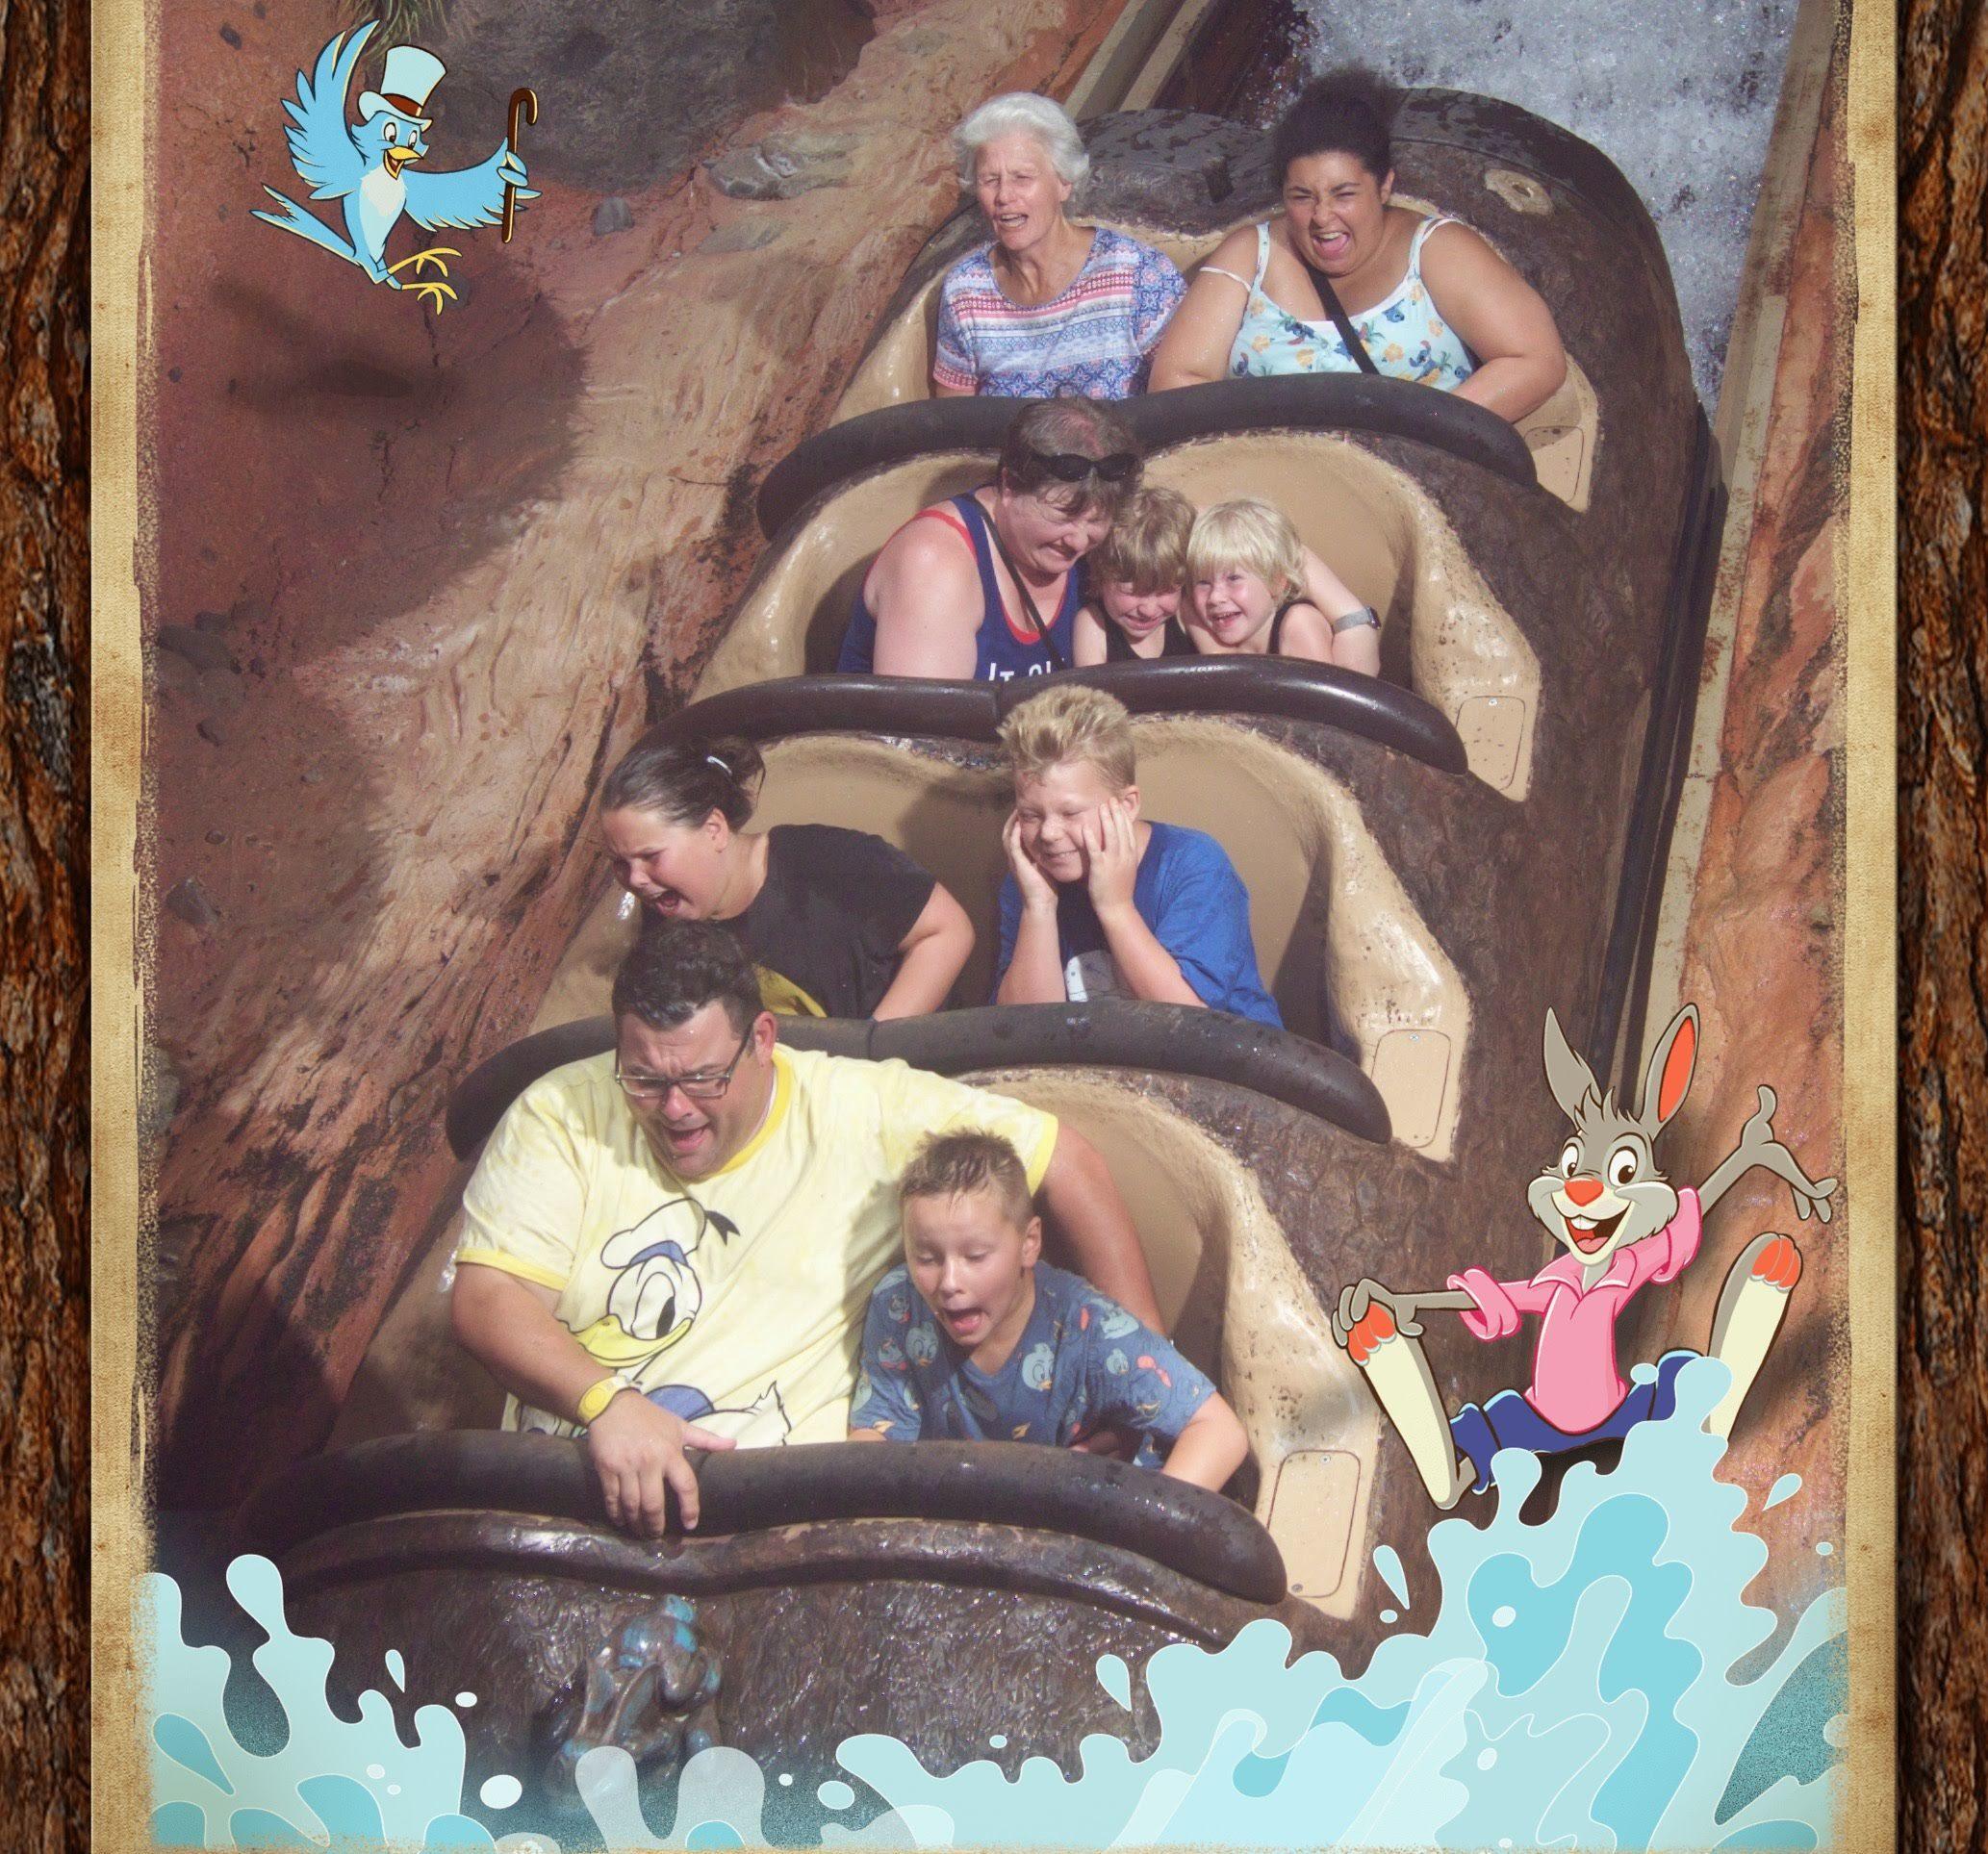 My Favorite Things At Walt Disney World